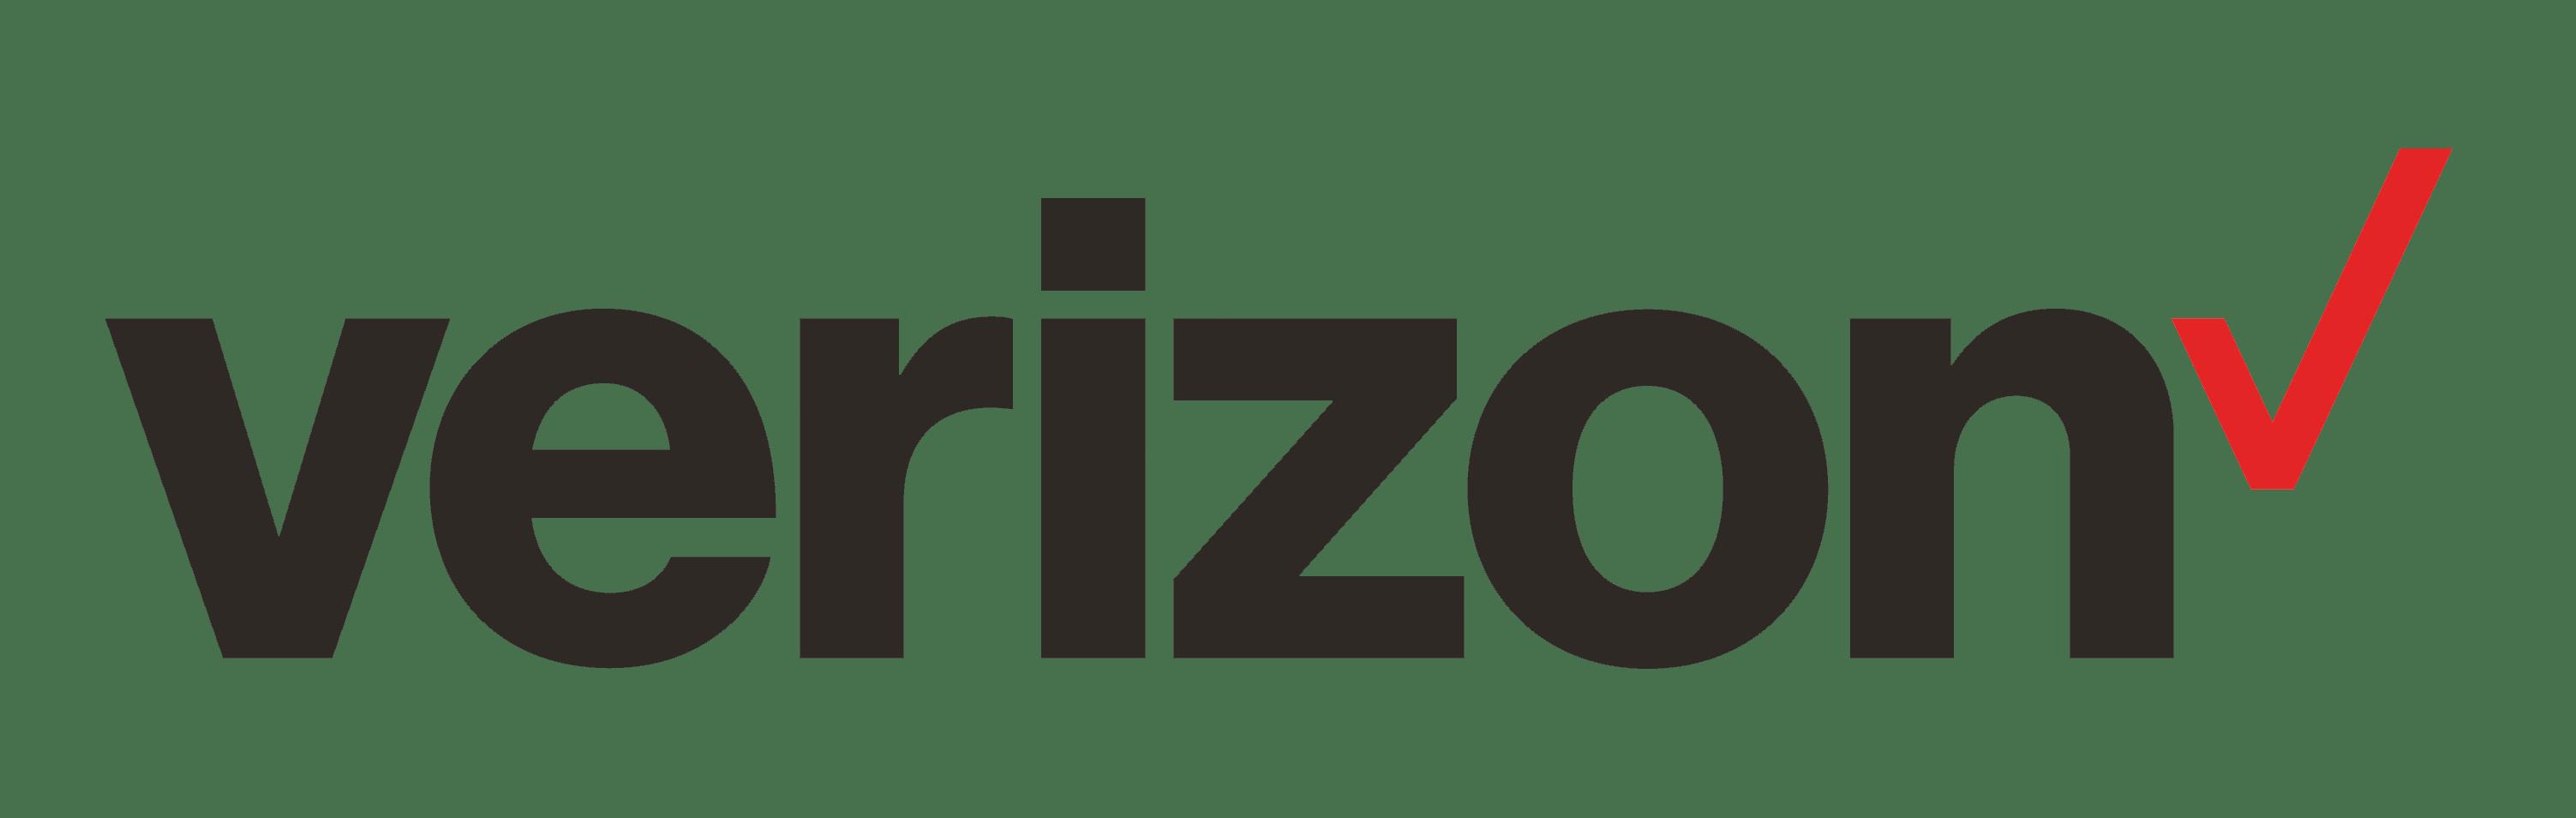 Verizon Network Provider